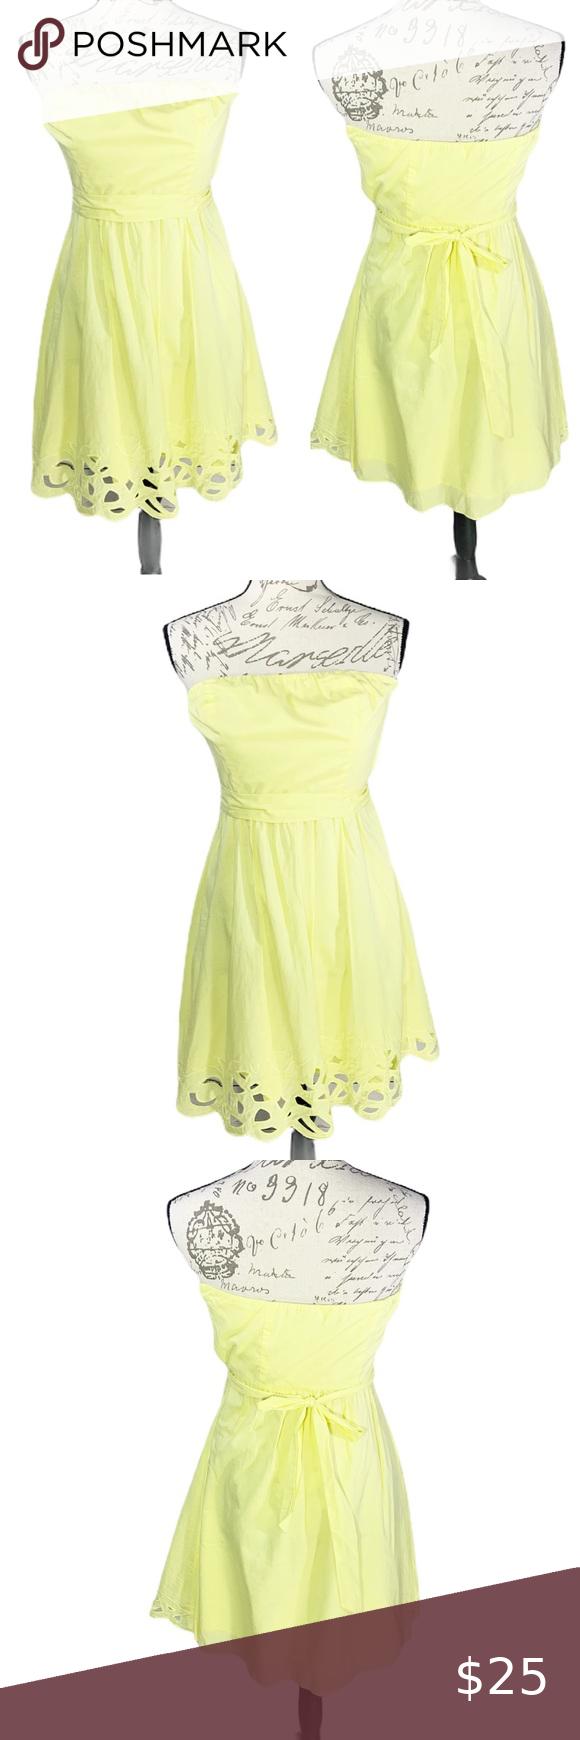 The Limited Bright Yellow Strapless Dress Sz 2 In 2020 Cute Yellow Dresses Yellow Strapless Dress Strapless Dress [ 1740 x 580 Pixel ]